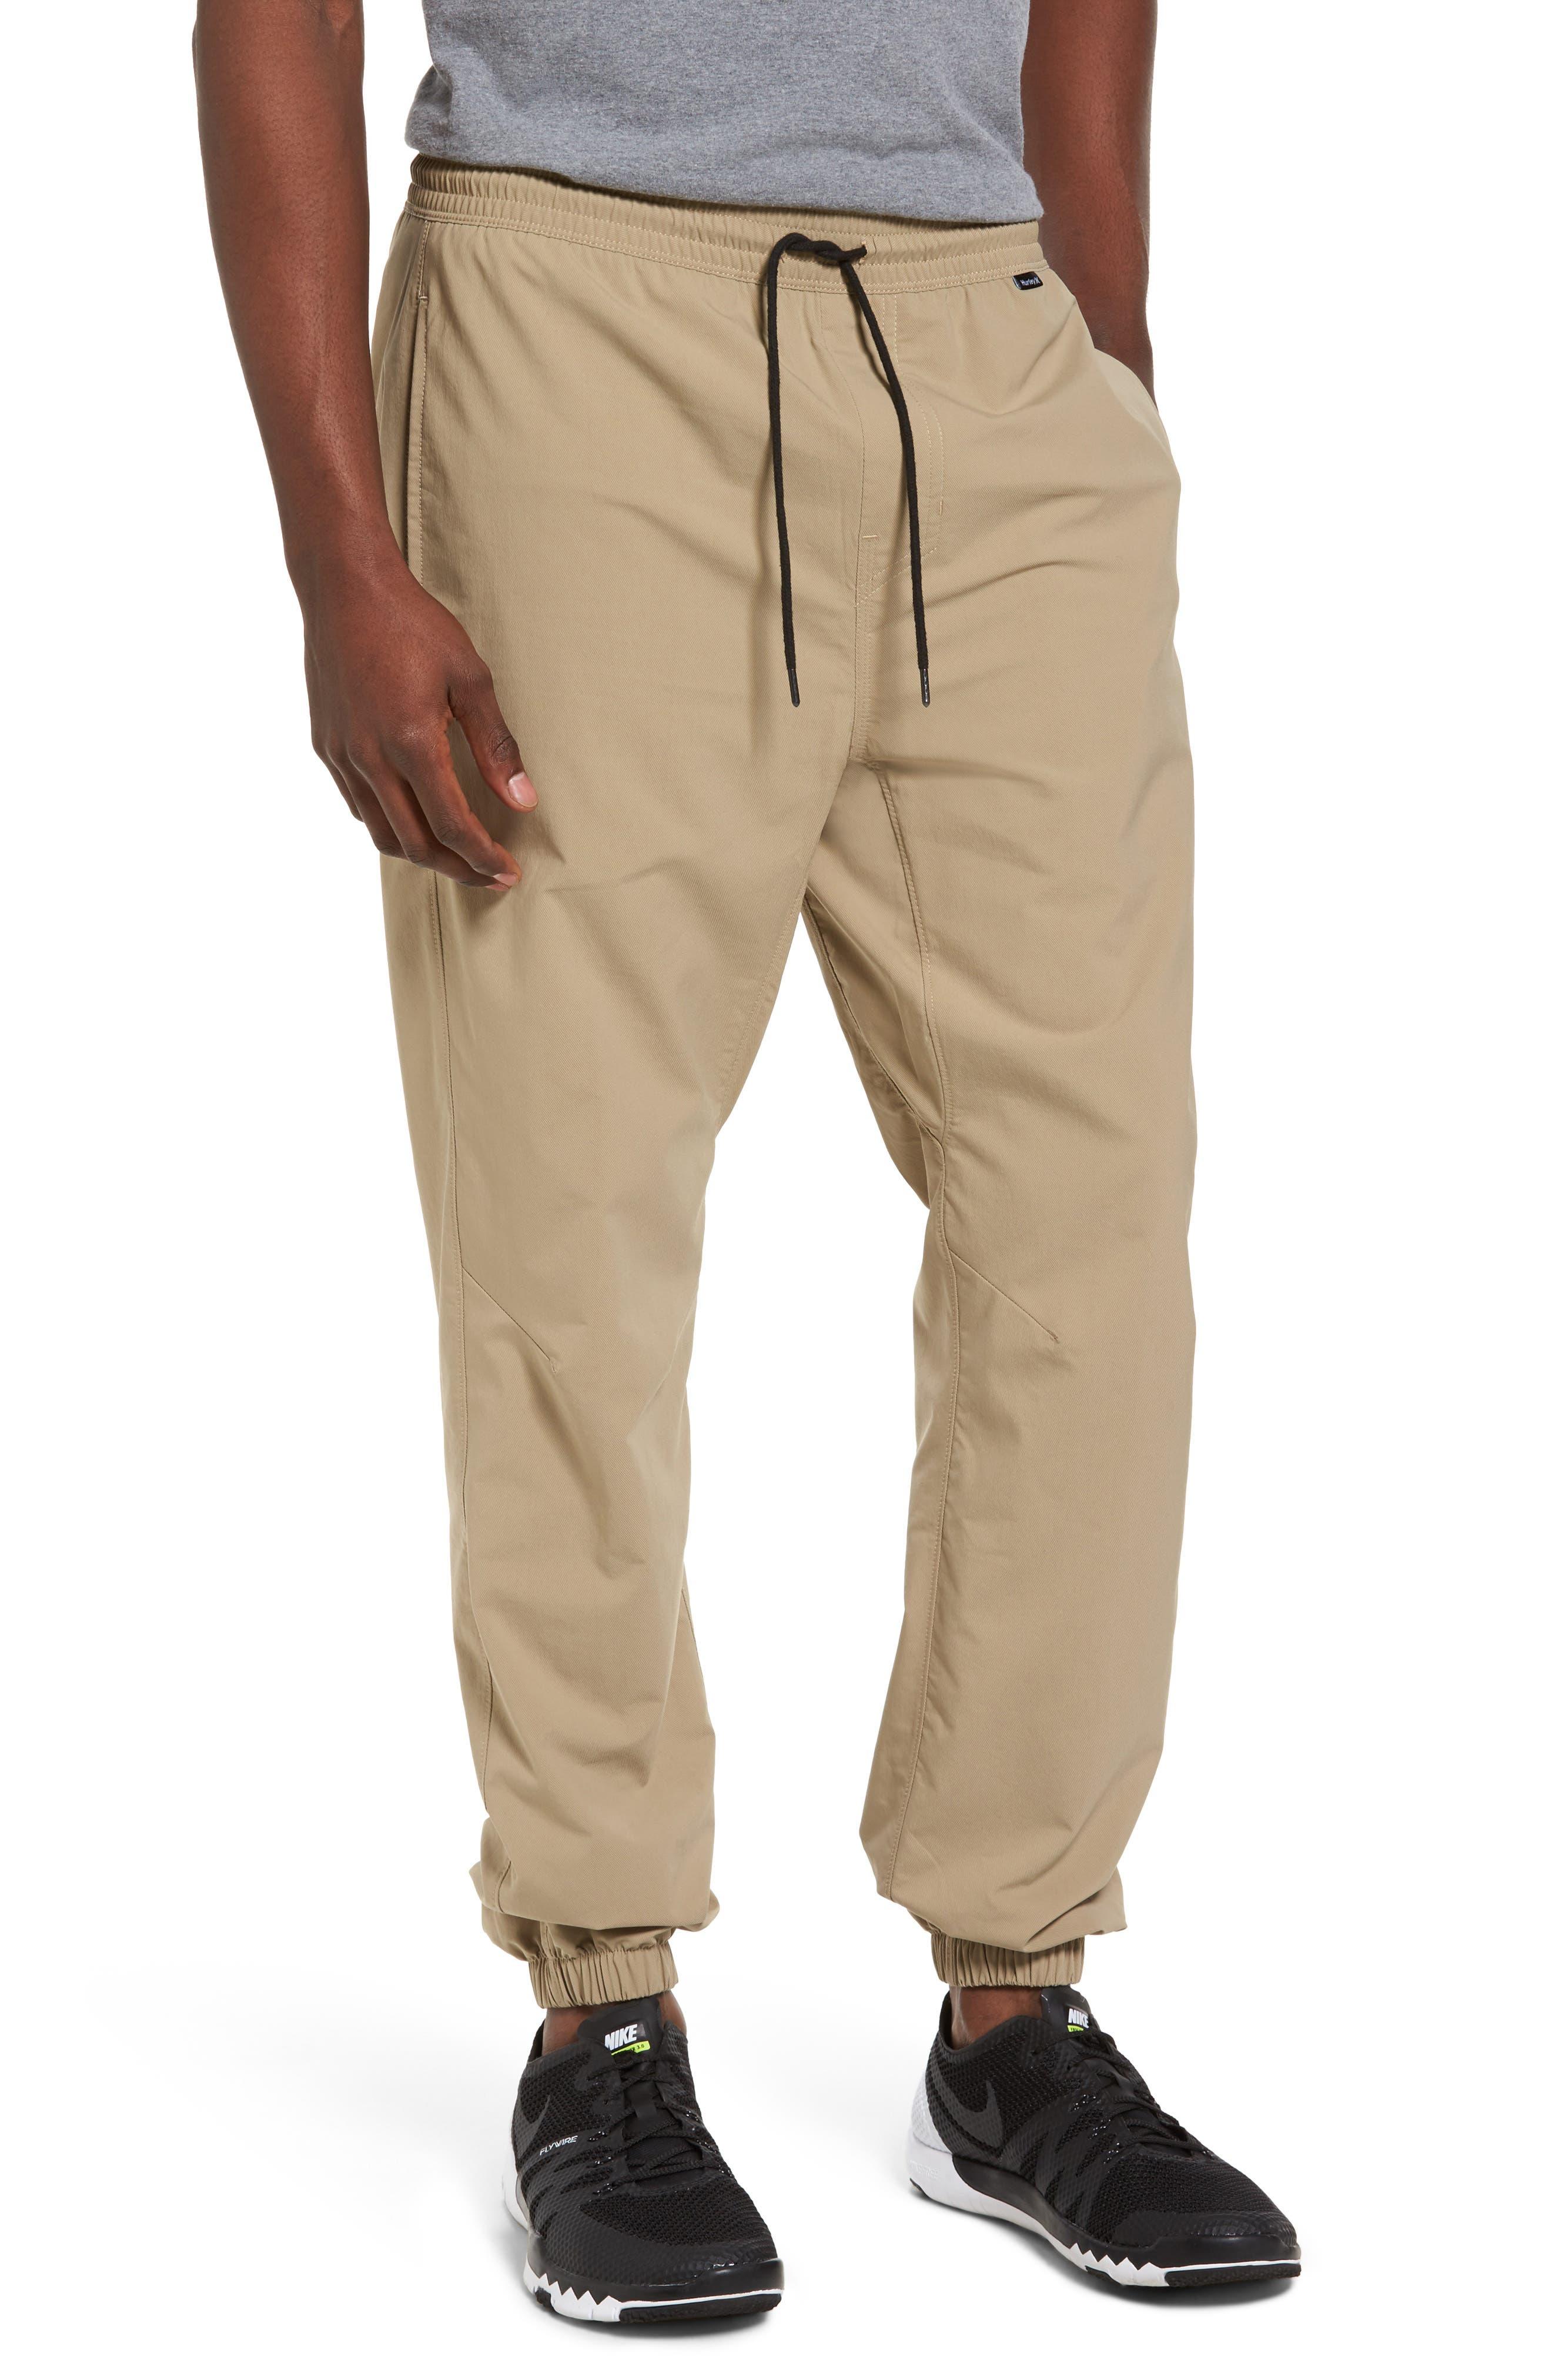 Alternate Image 1 Selected - Hurley Dri-FIT Jogger Pants